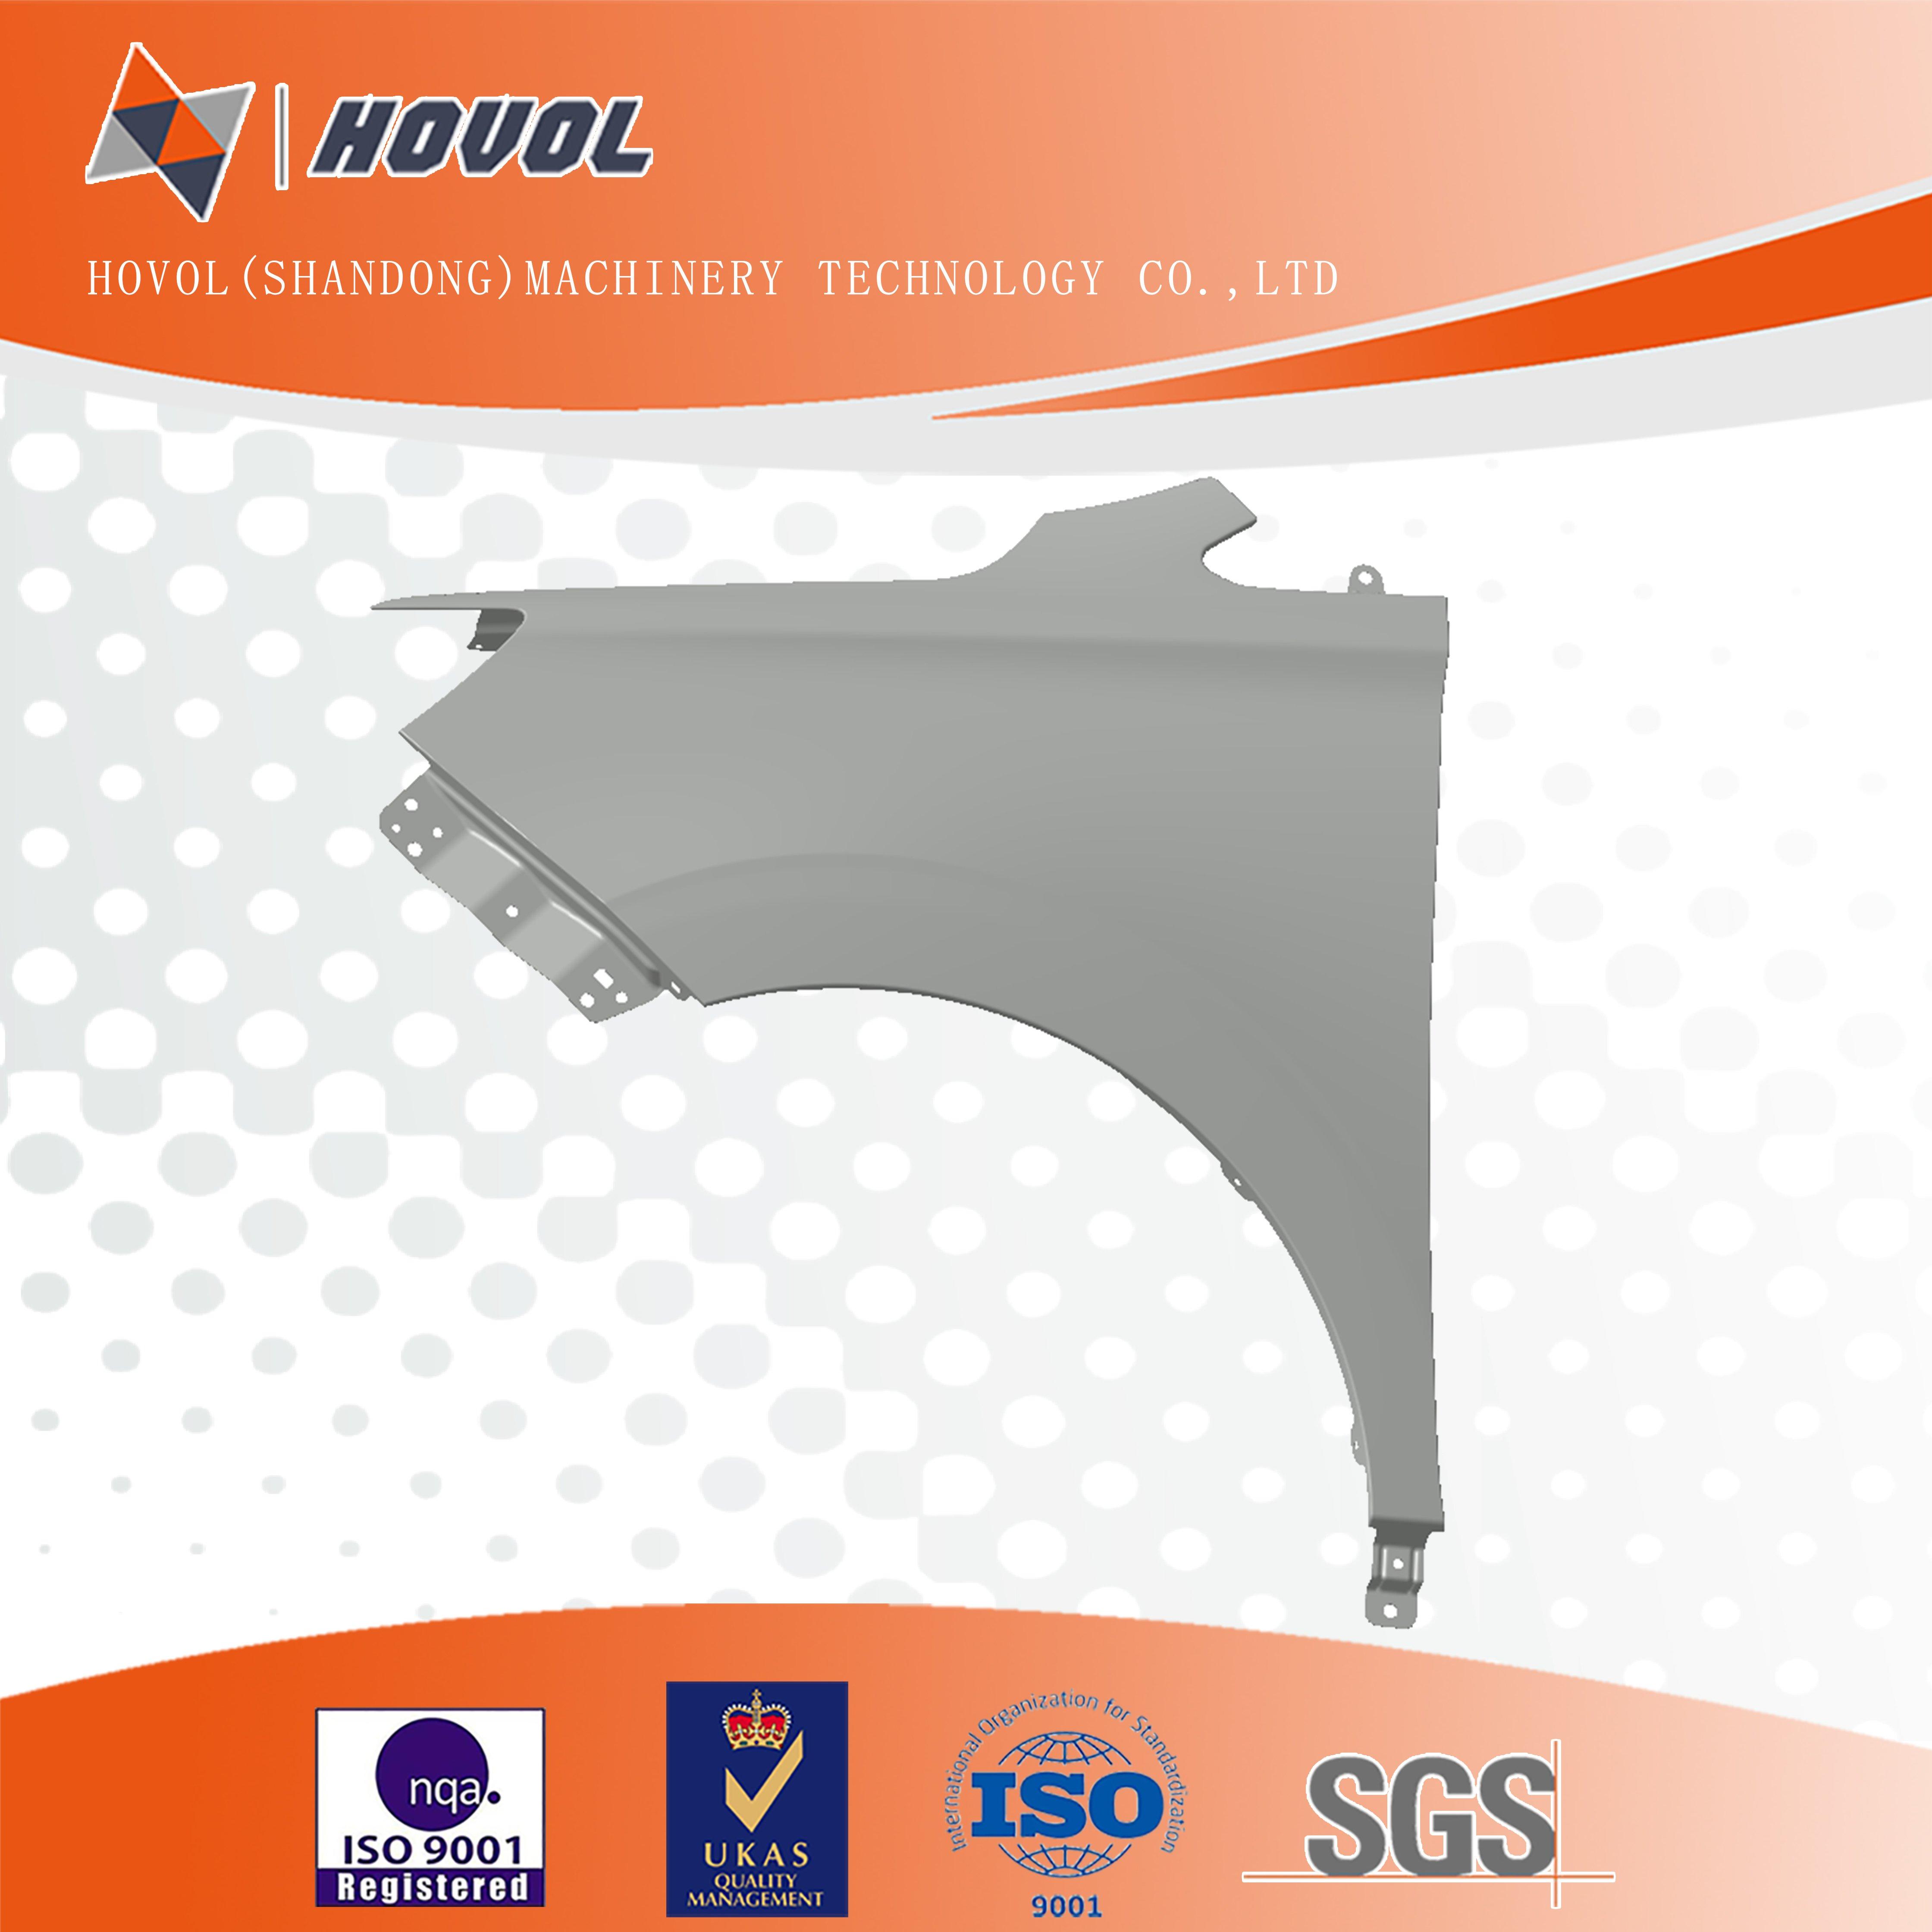 HOVOL (Shandong) Machinery Technology Co., Ltd.